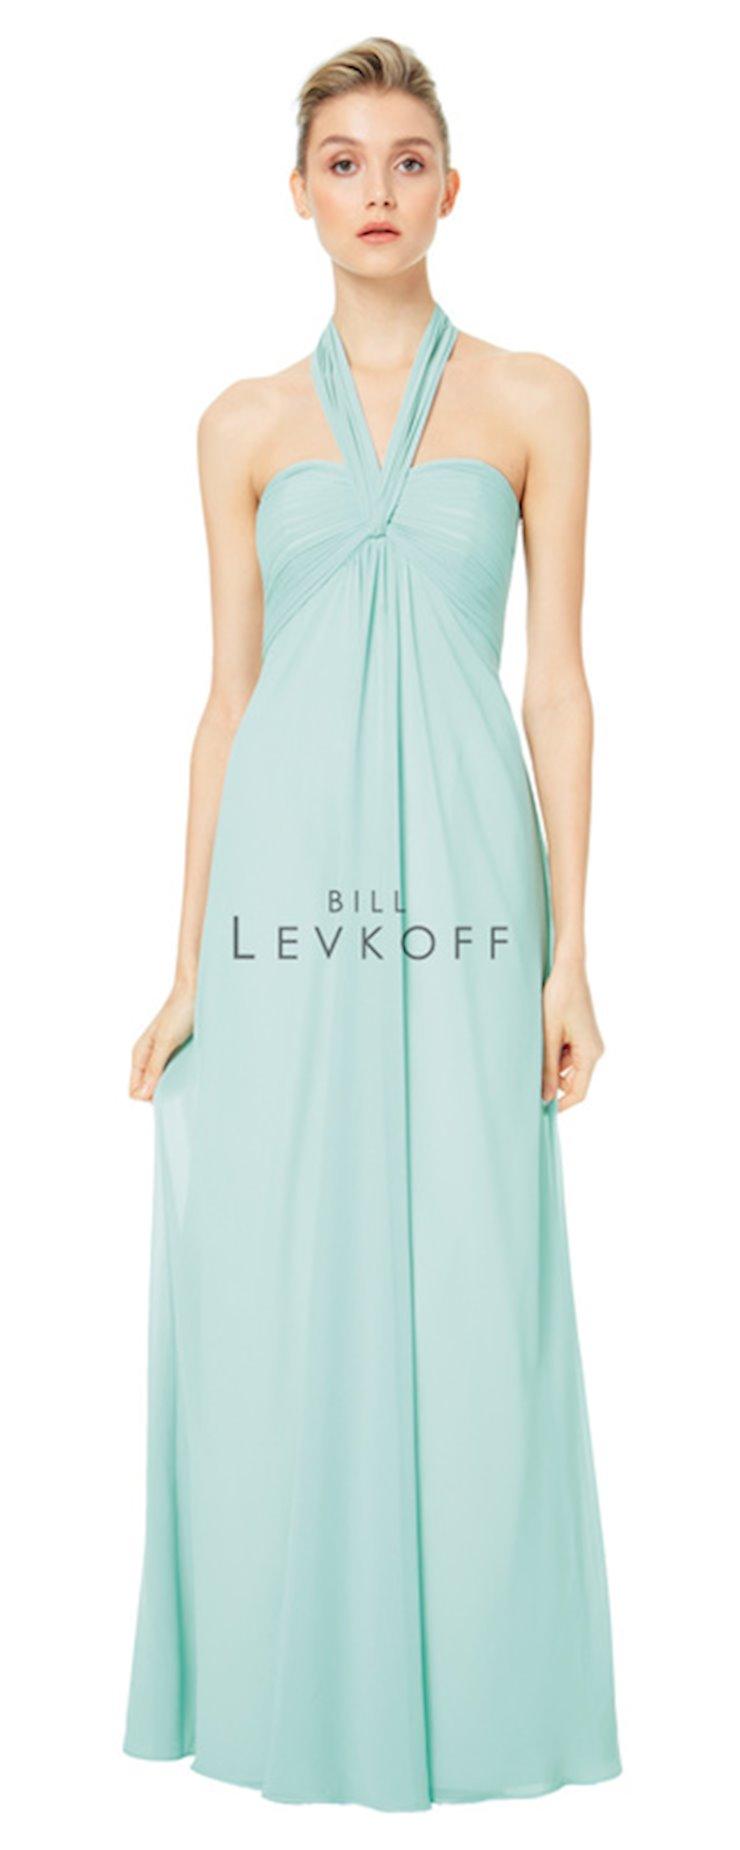 Bill Levkoff Style #1508